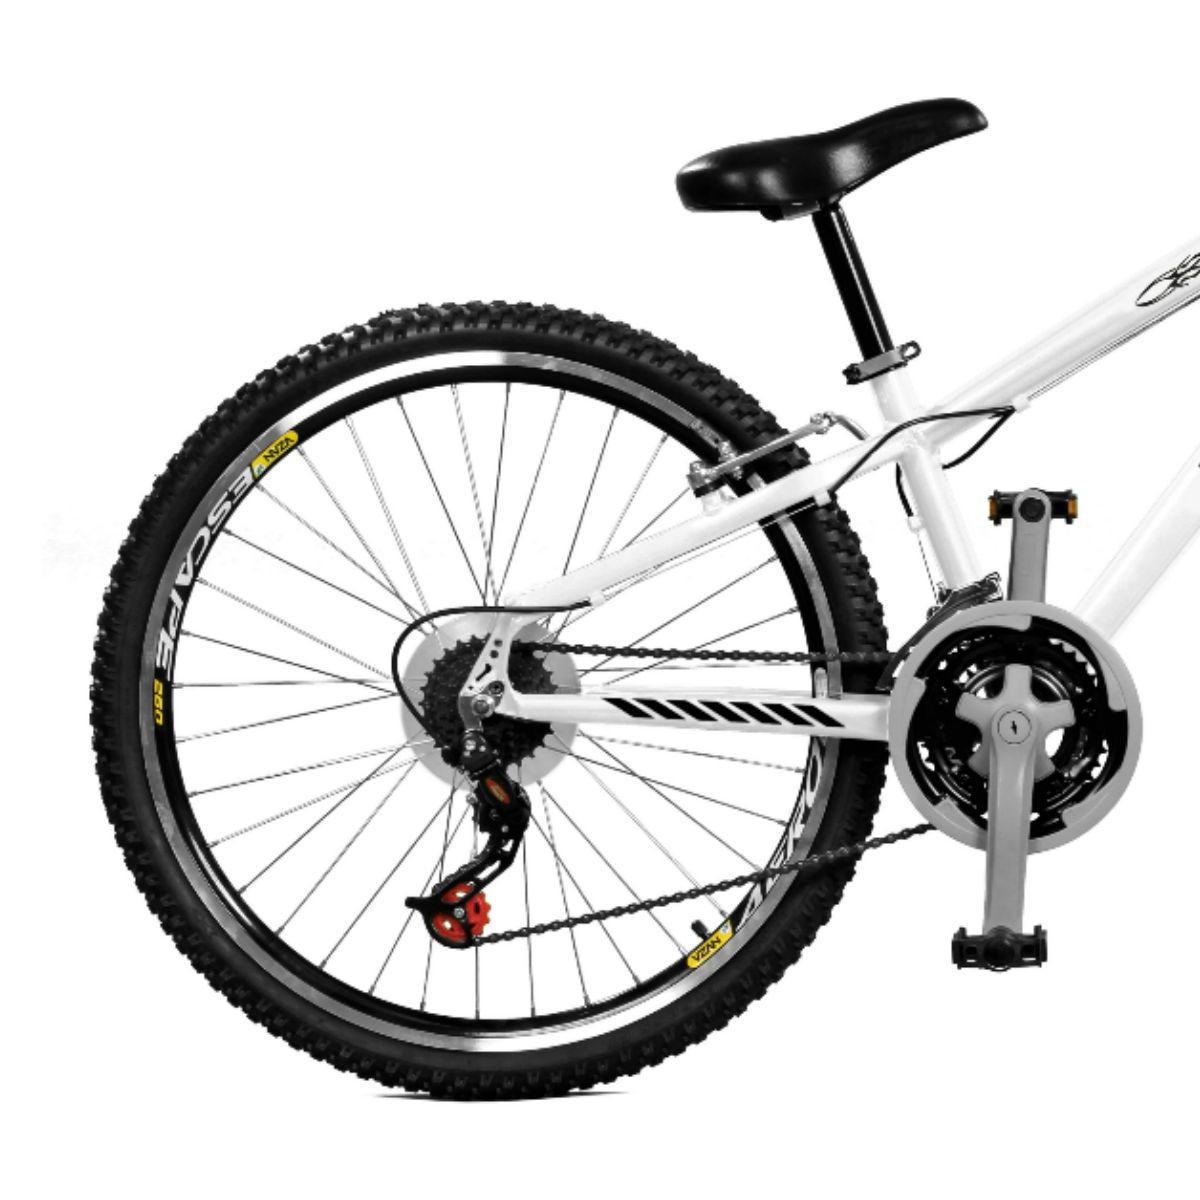 Bicicleta Master Bike Aro 26 Free Rider S A-36 21 Marchas Branco